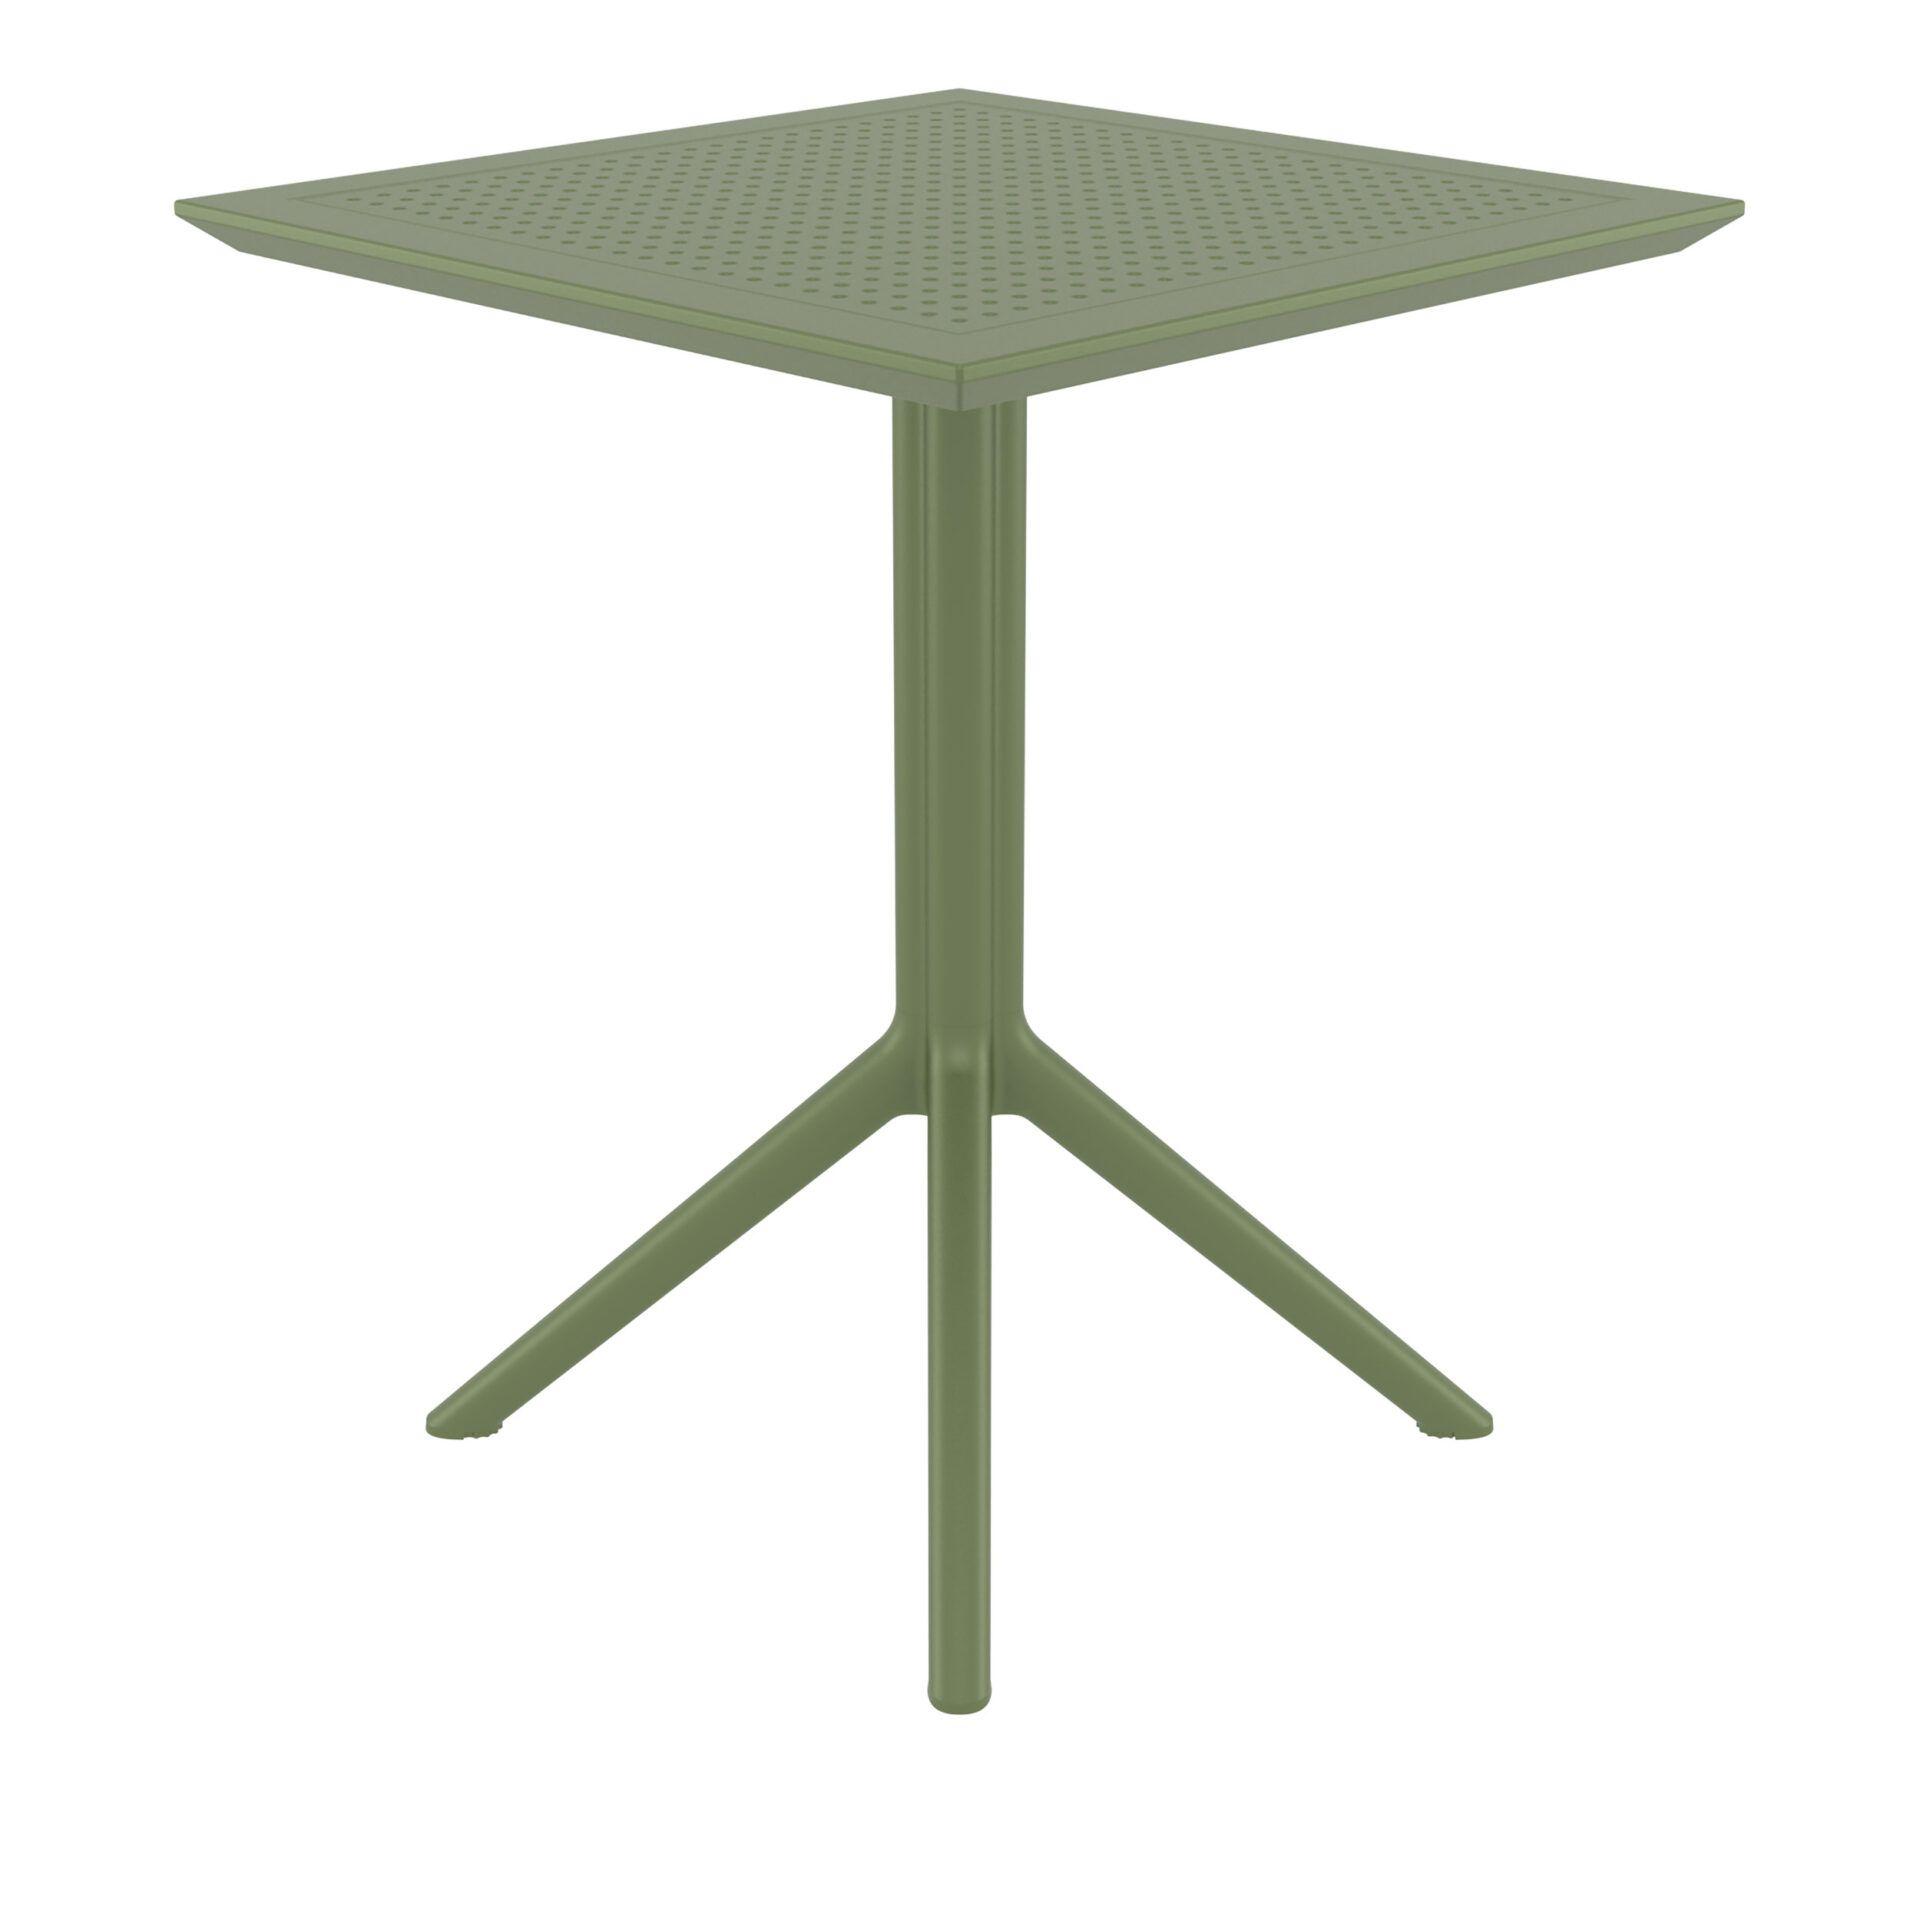 polypropylene outdoor sky folding bar table 60 olive green side